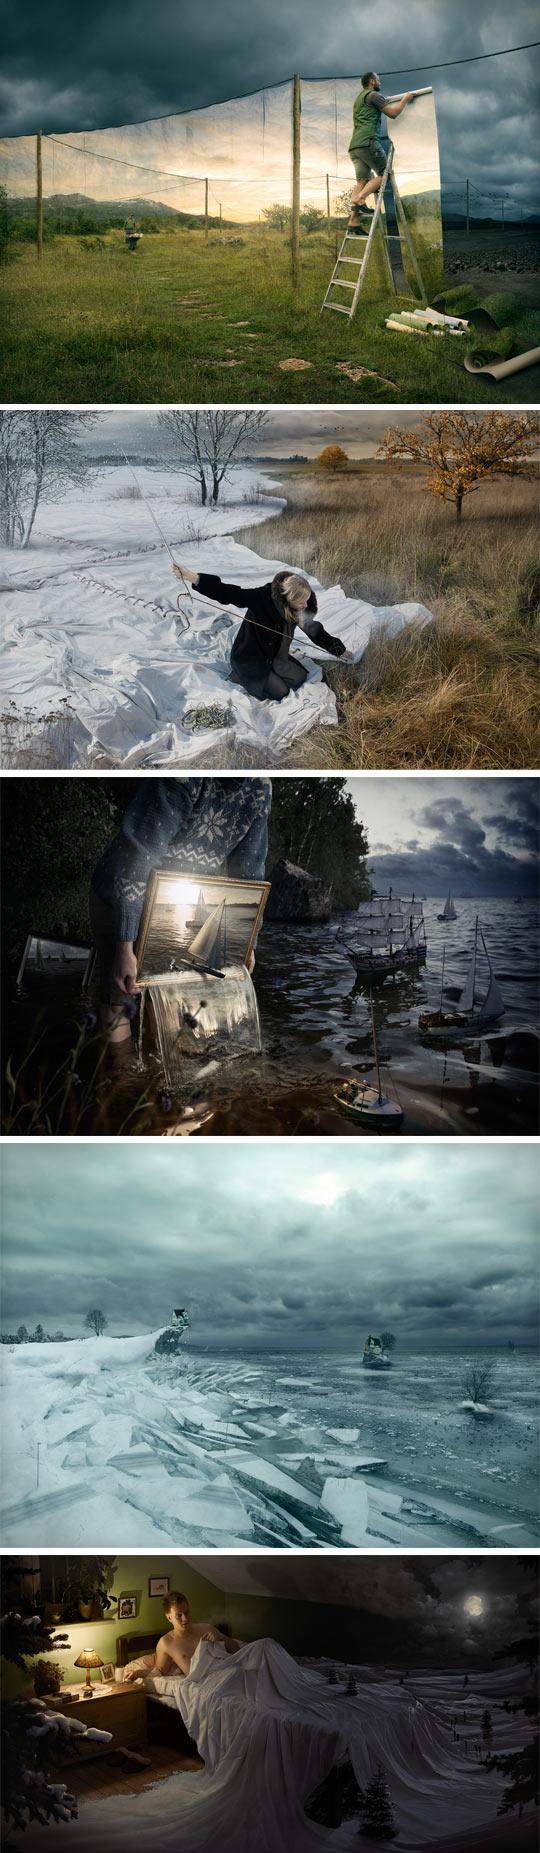 Surreal photos...